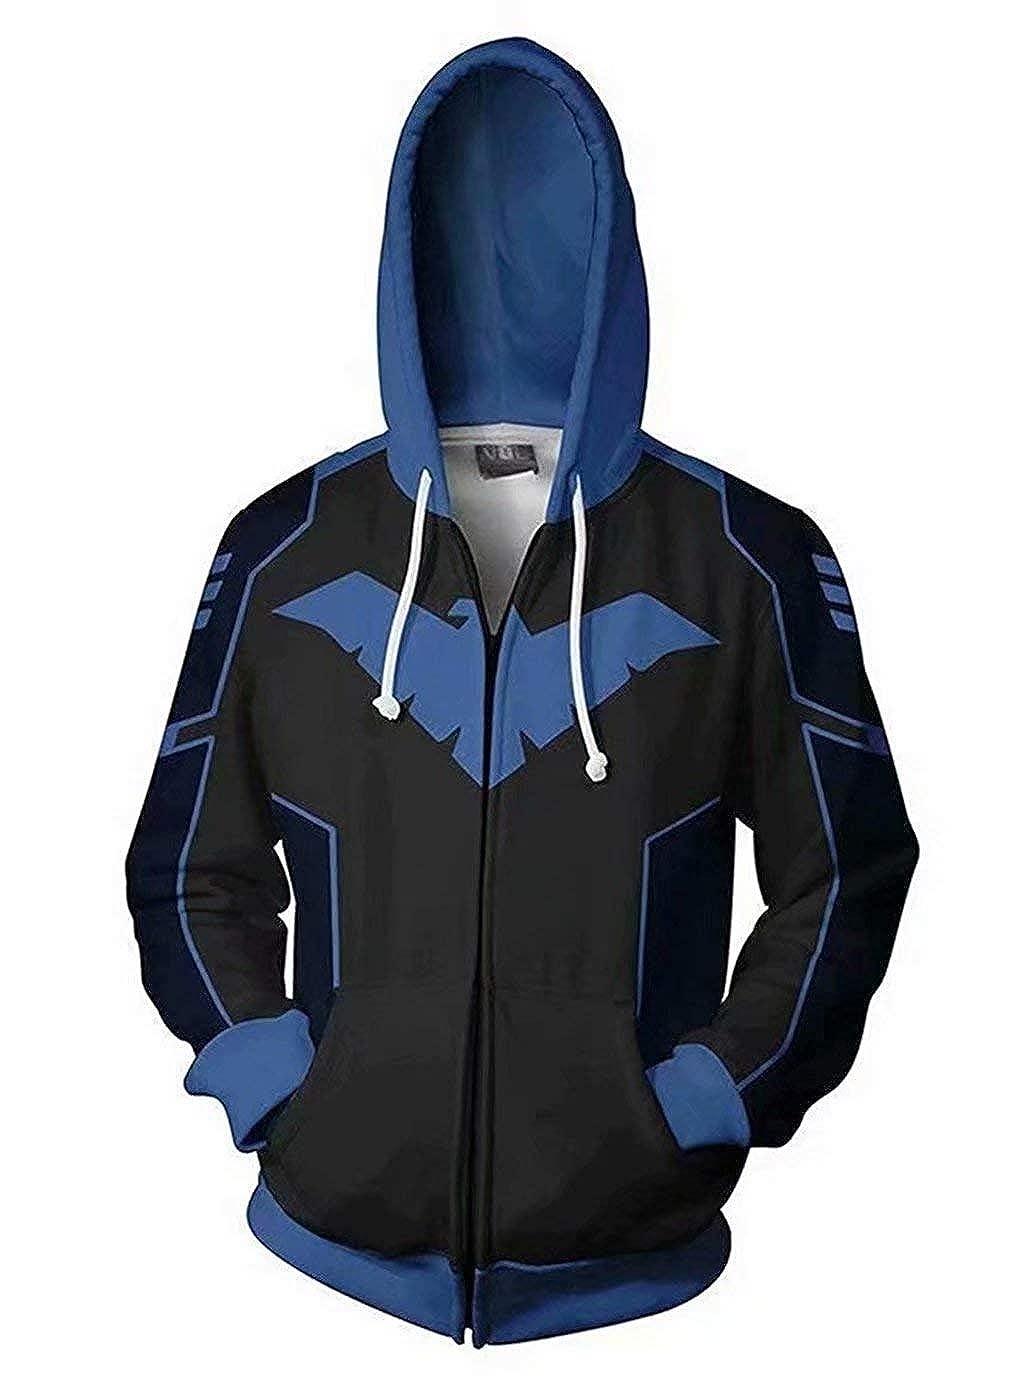 Greed Land Super Hero 3D Print Zipper Hoodie Sweatshirts Cosplay Costumes for Adult